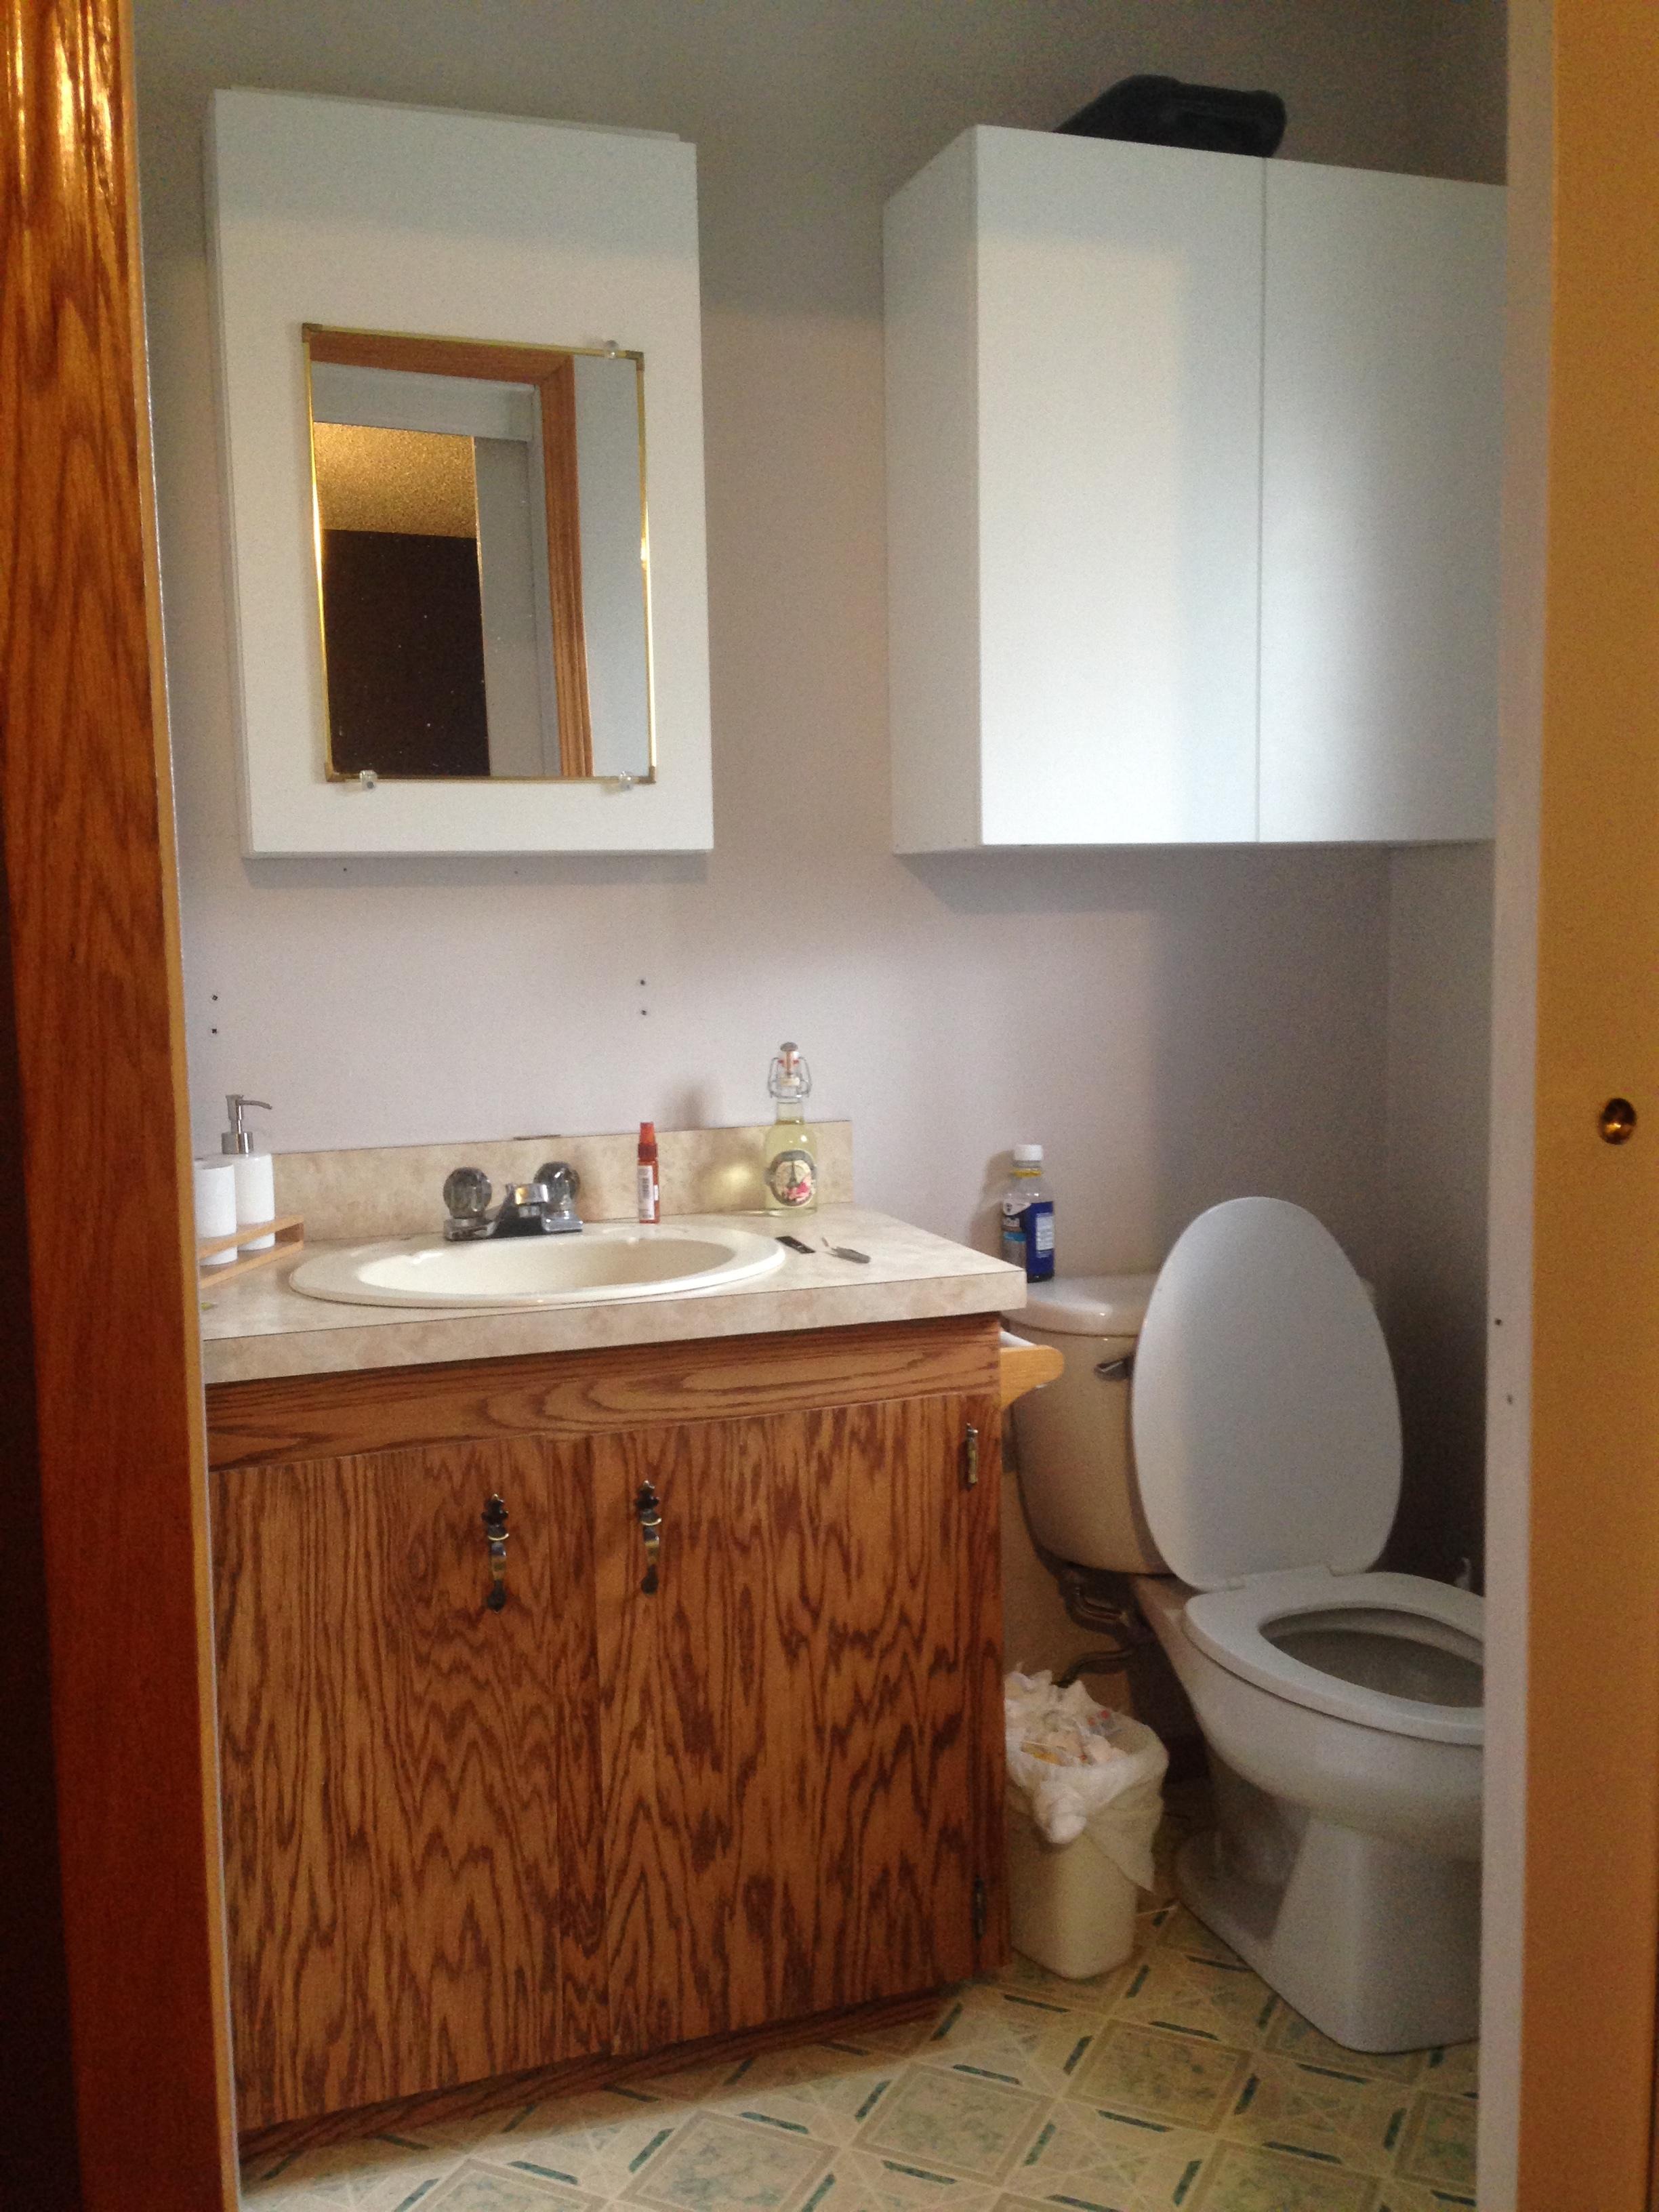 The Hideous Original Bathroom